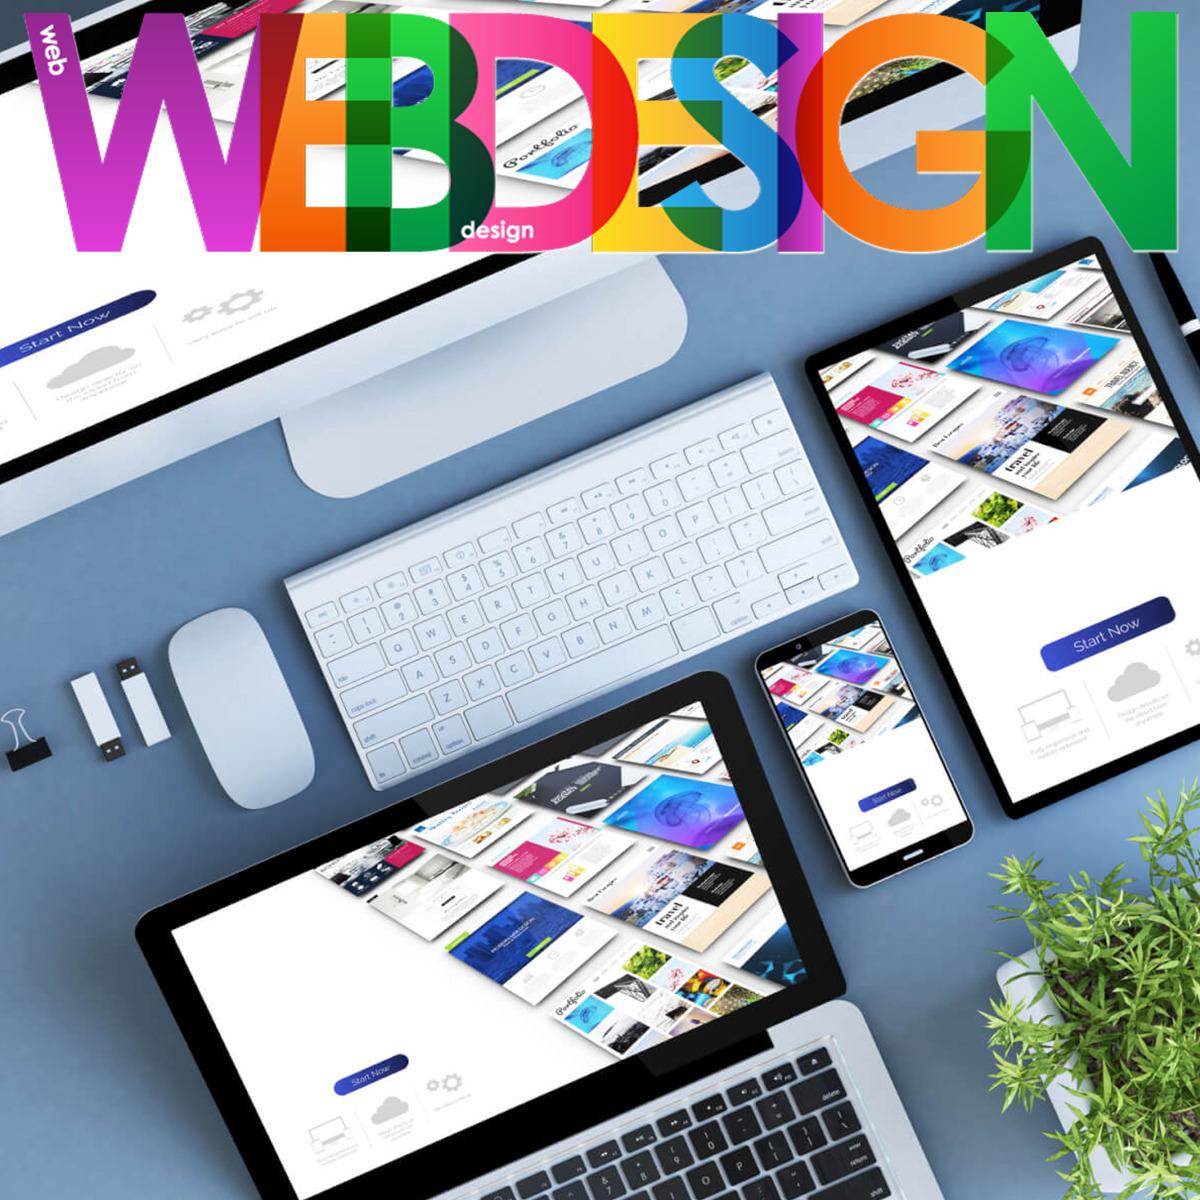 Teksyte Seo Services Graphic Design